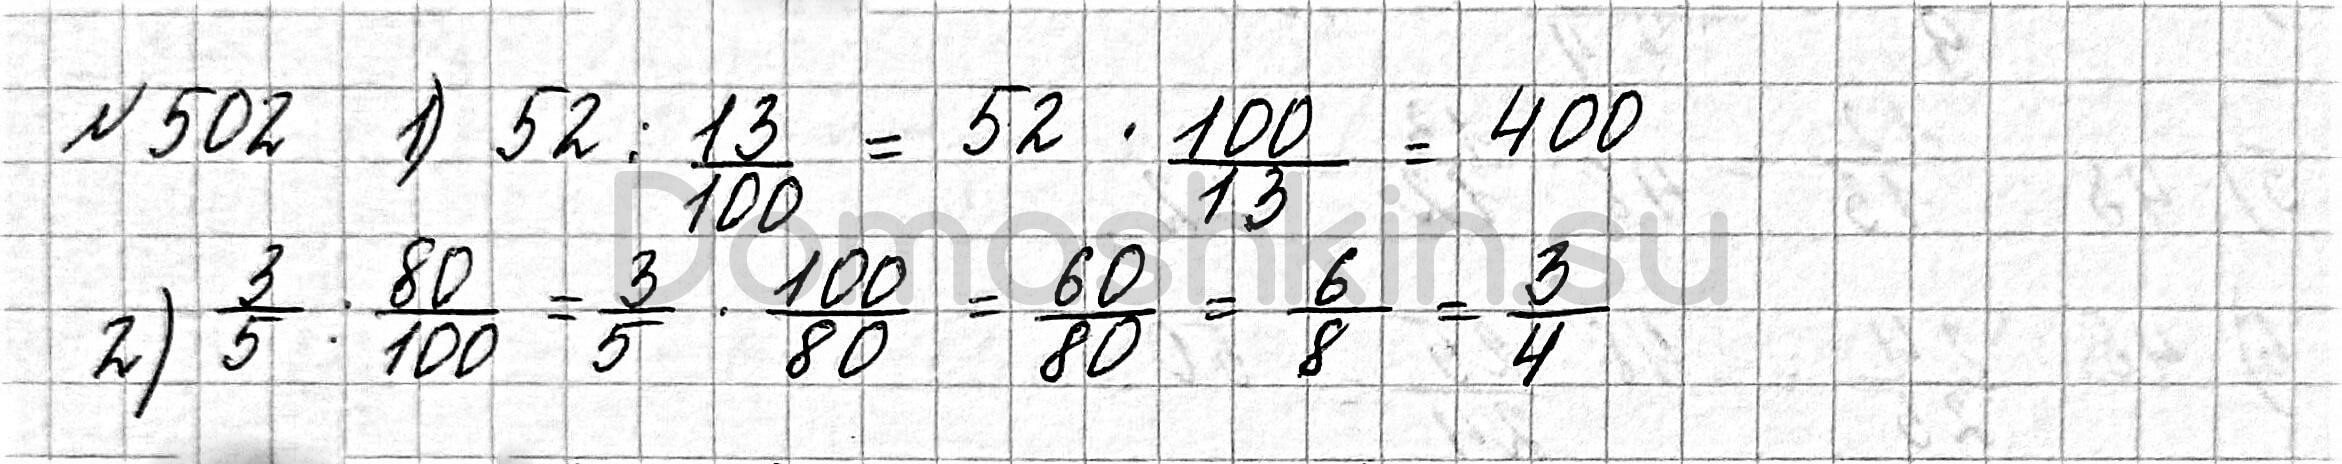 Математика 6 класс учебник Мерзляк номер 502 решение